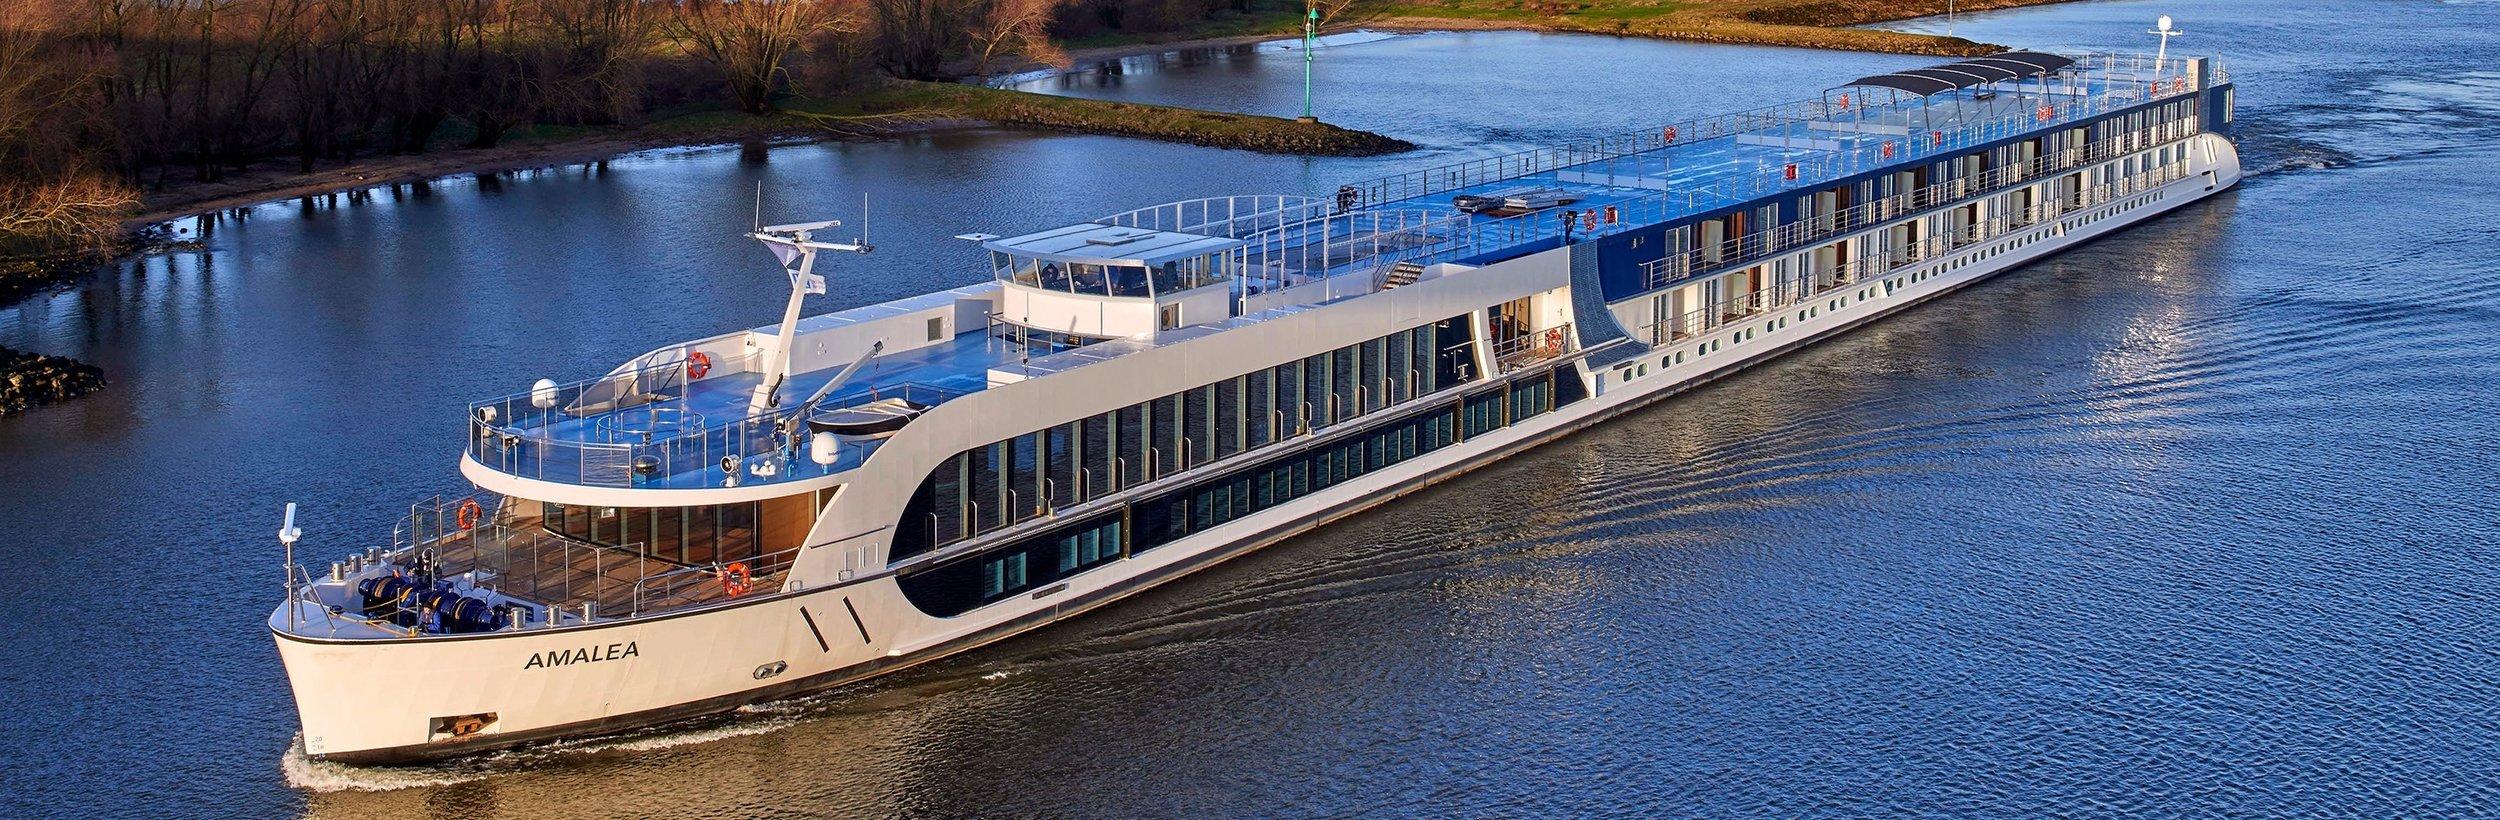 River Ship.jpg